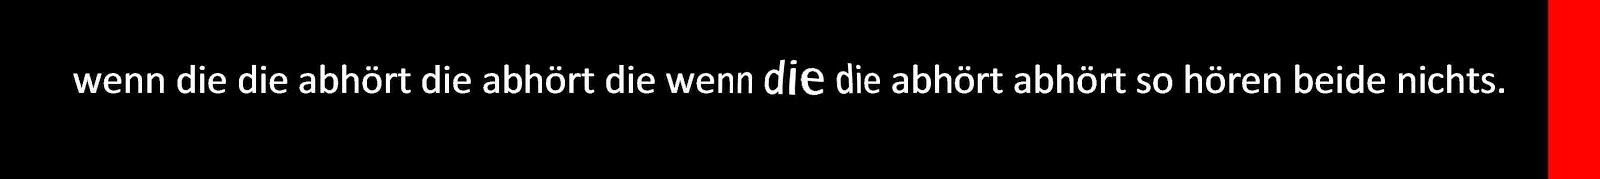 totalüberwachung deutschland MISCHA VETERE bnd deutsche telekom gauck merkel FRANCE attentat nice